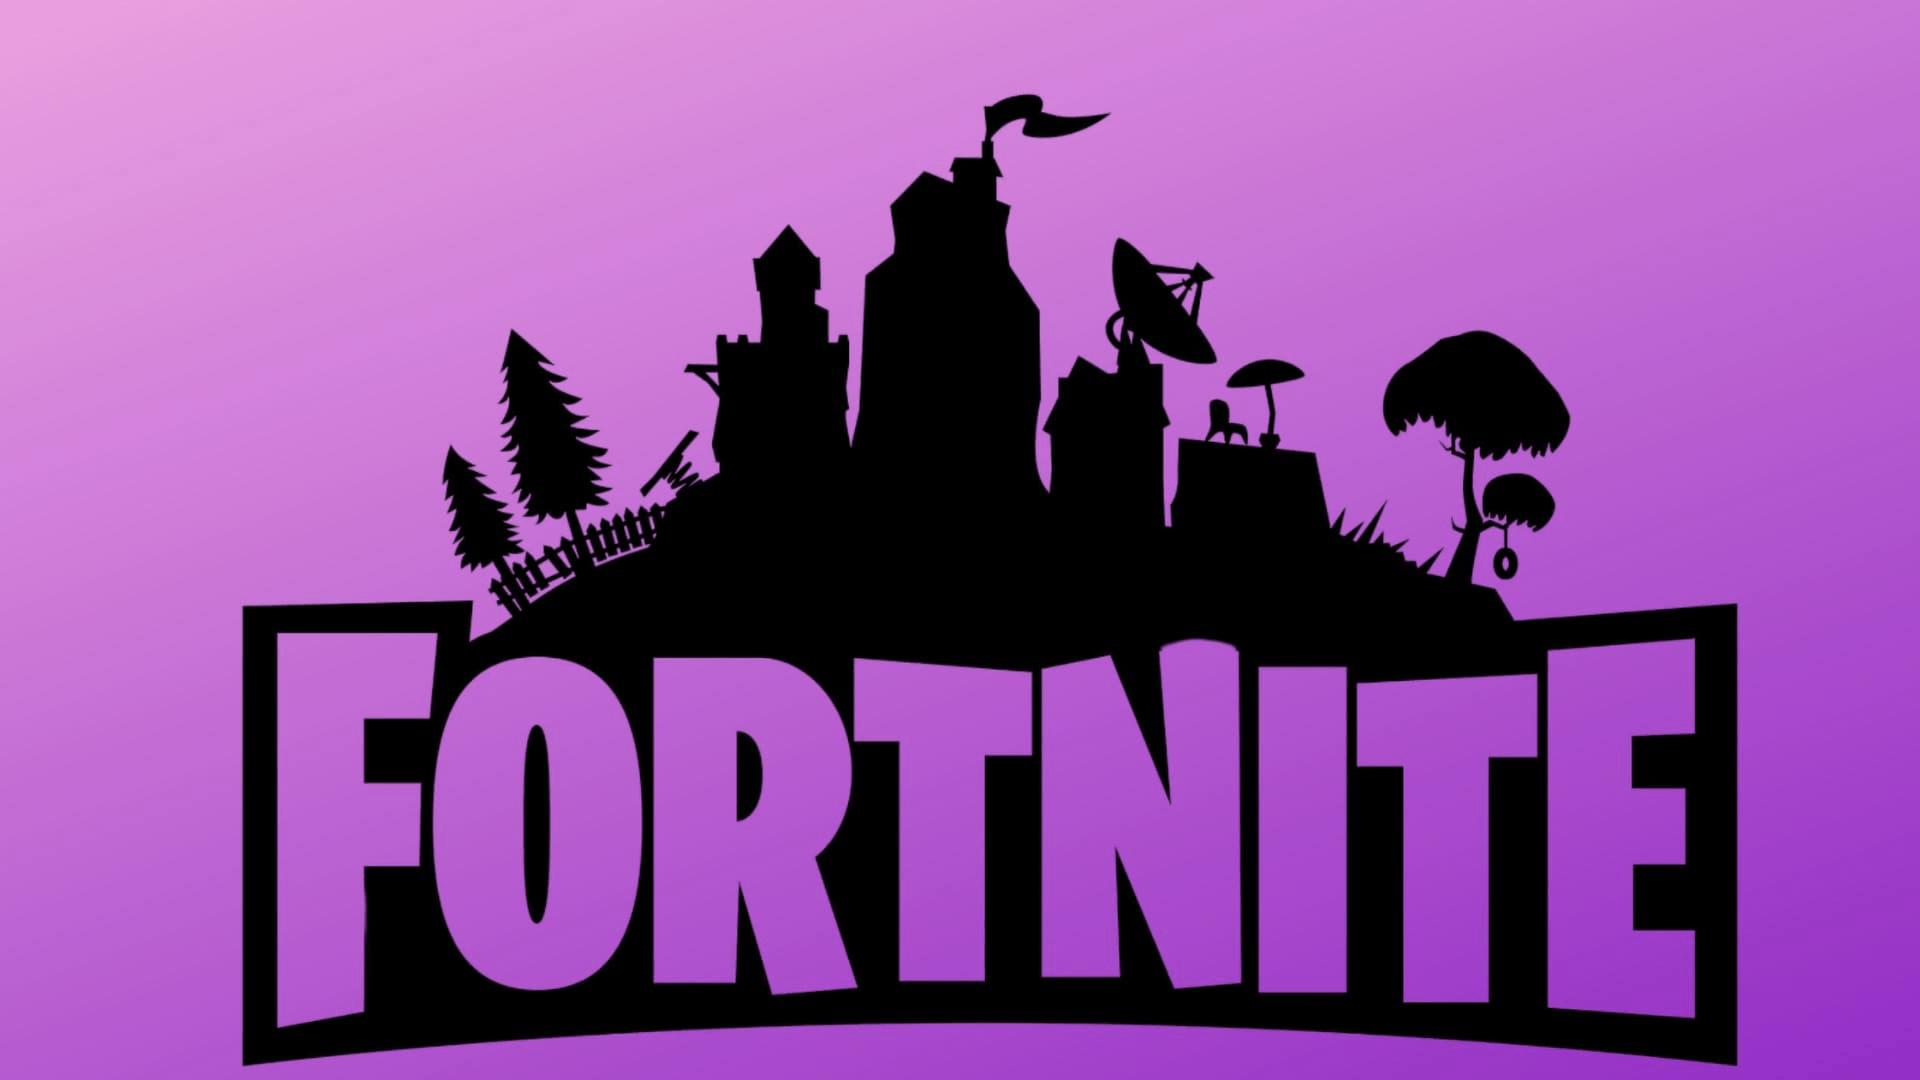 Fortnite Symbol